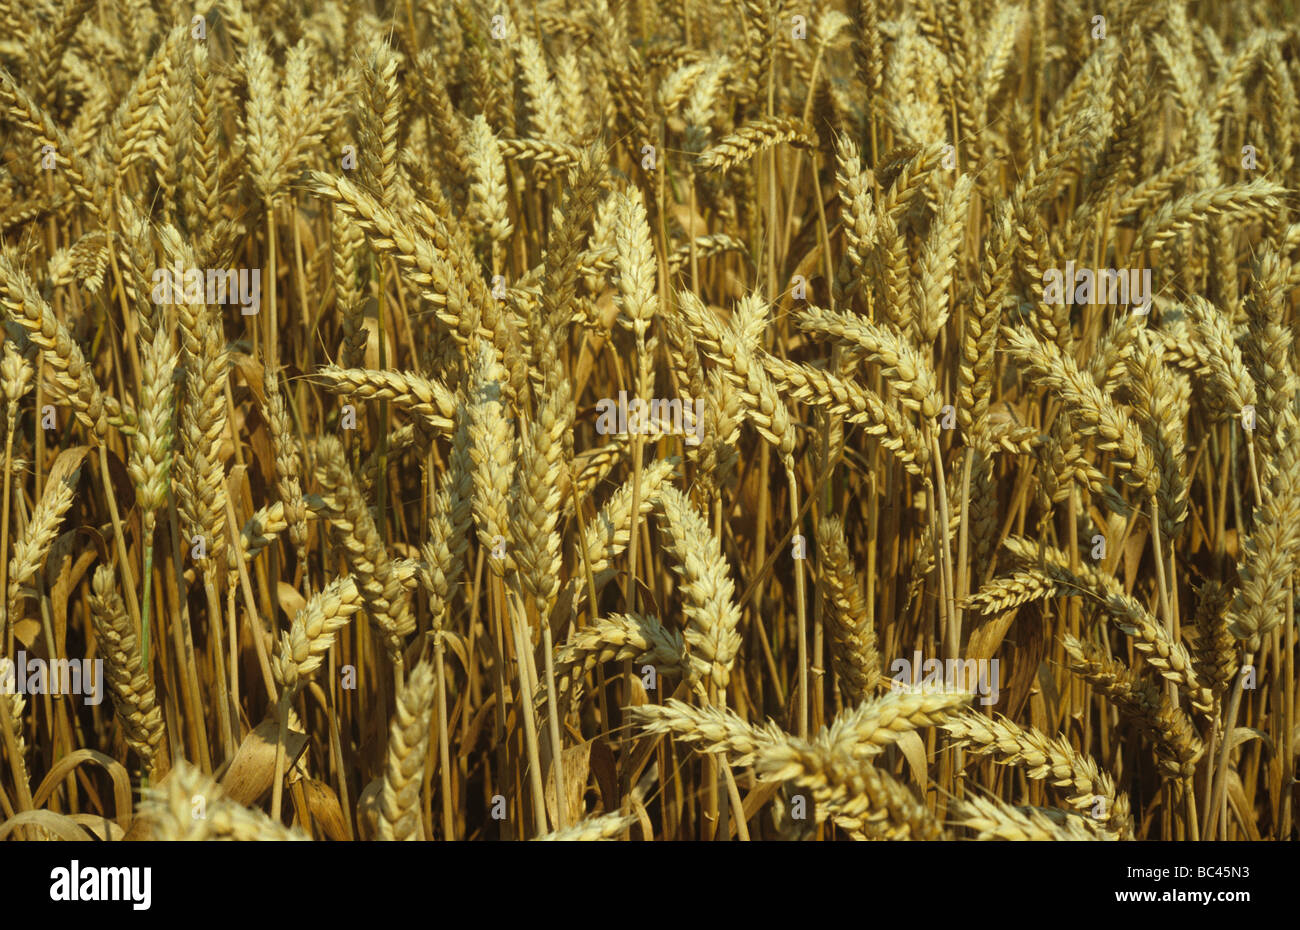 A ripe crop of winter wheat - Stock Image